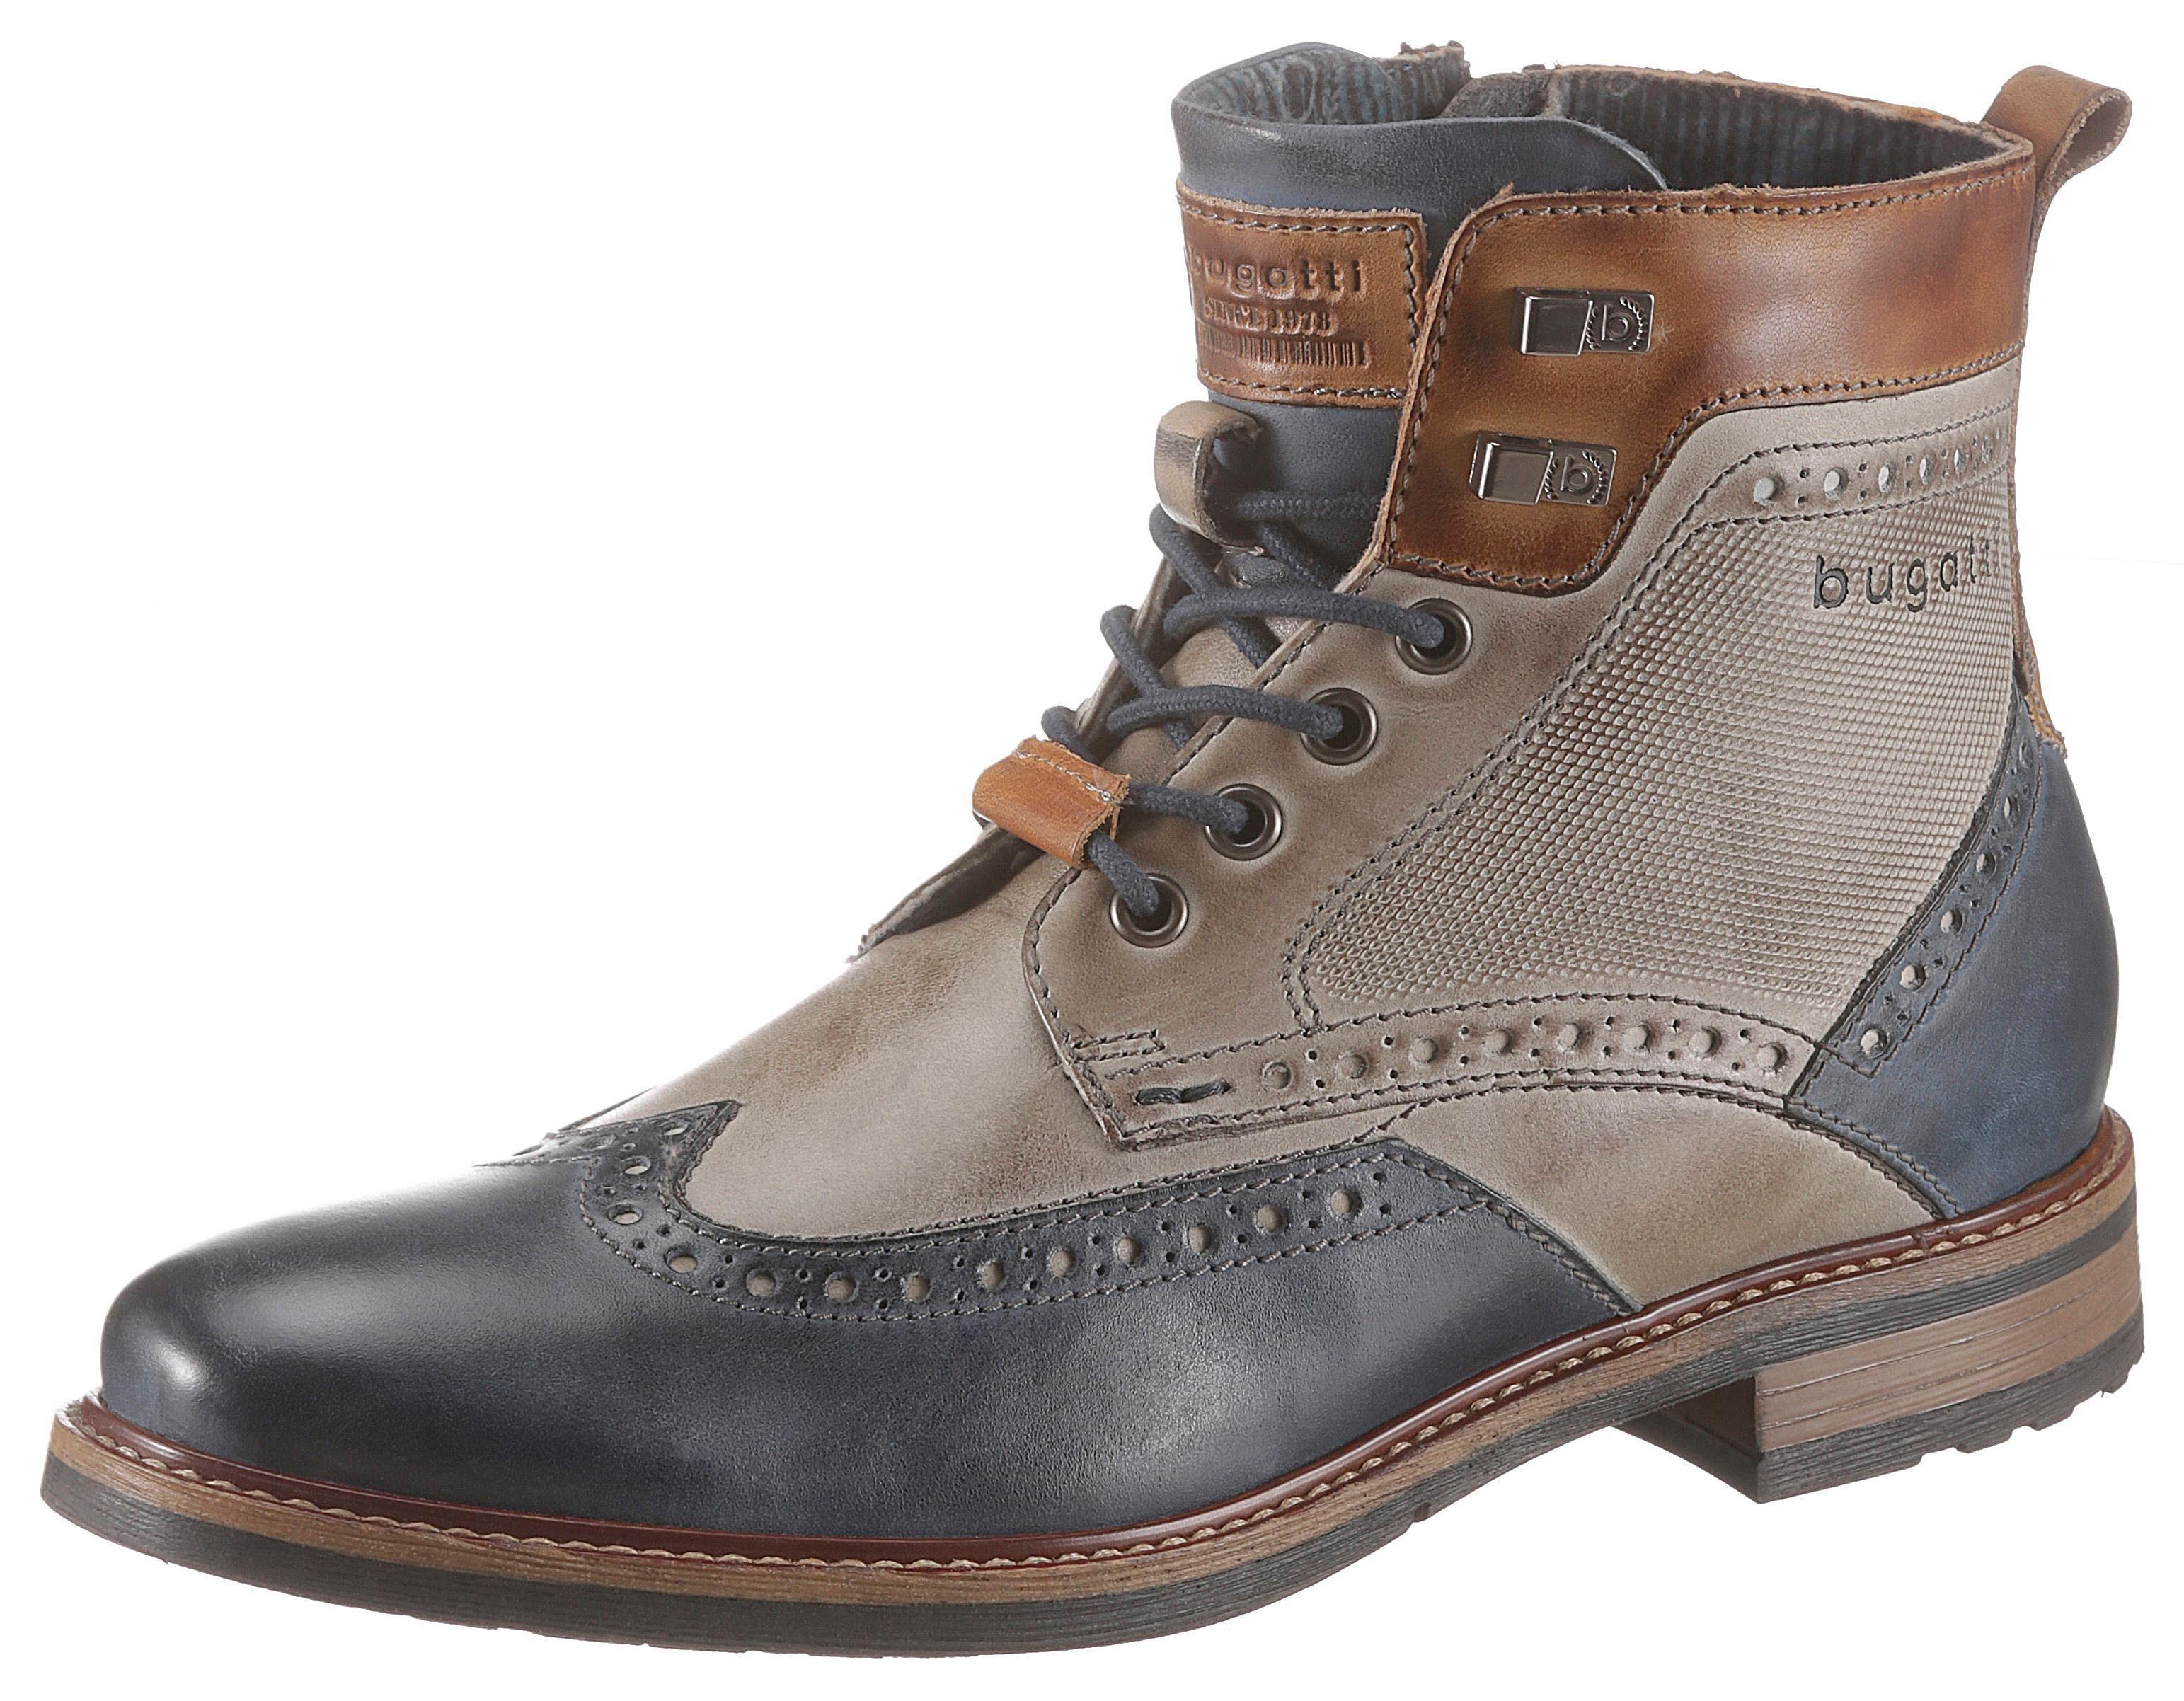 Bugatti laarzen kopen? | BESLIST.nl | Bugatti Boots